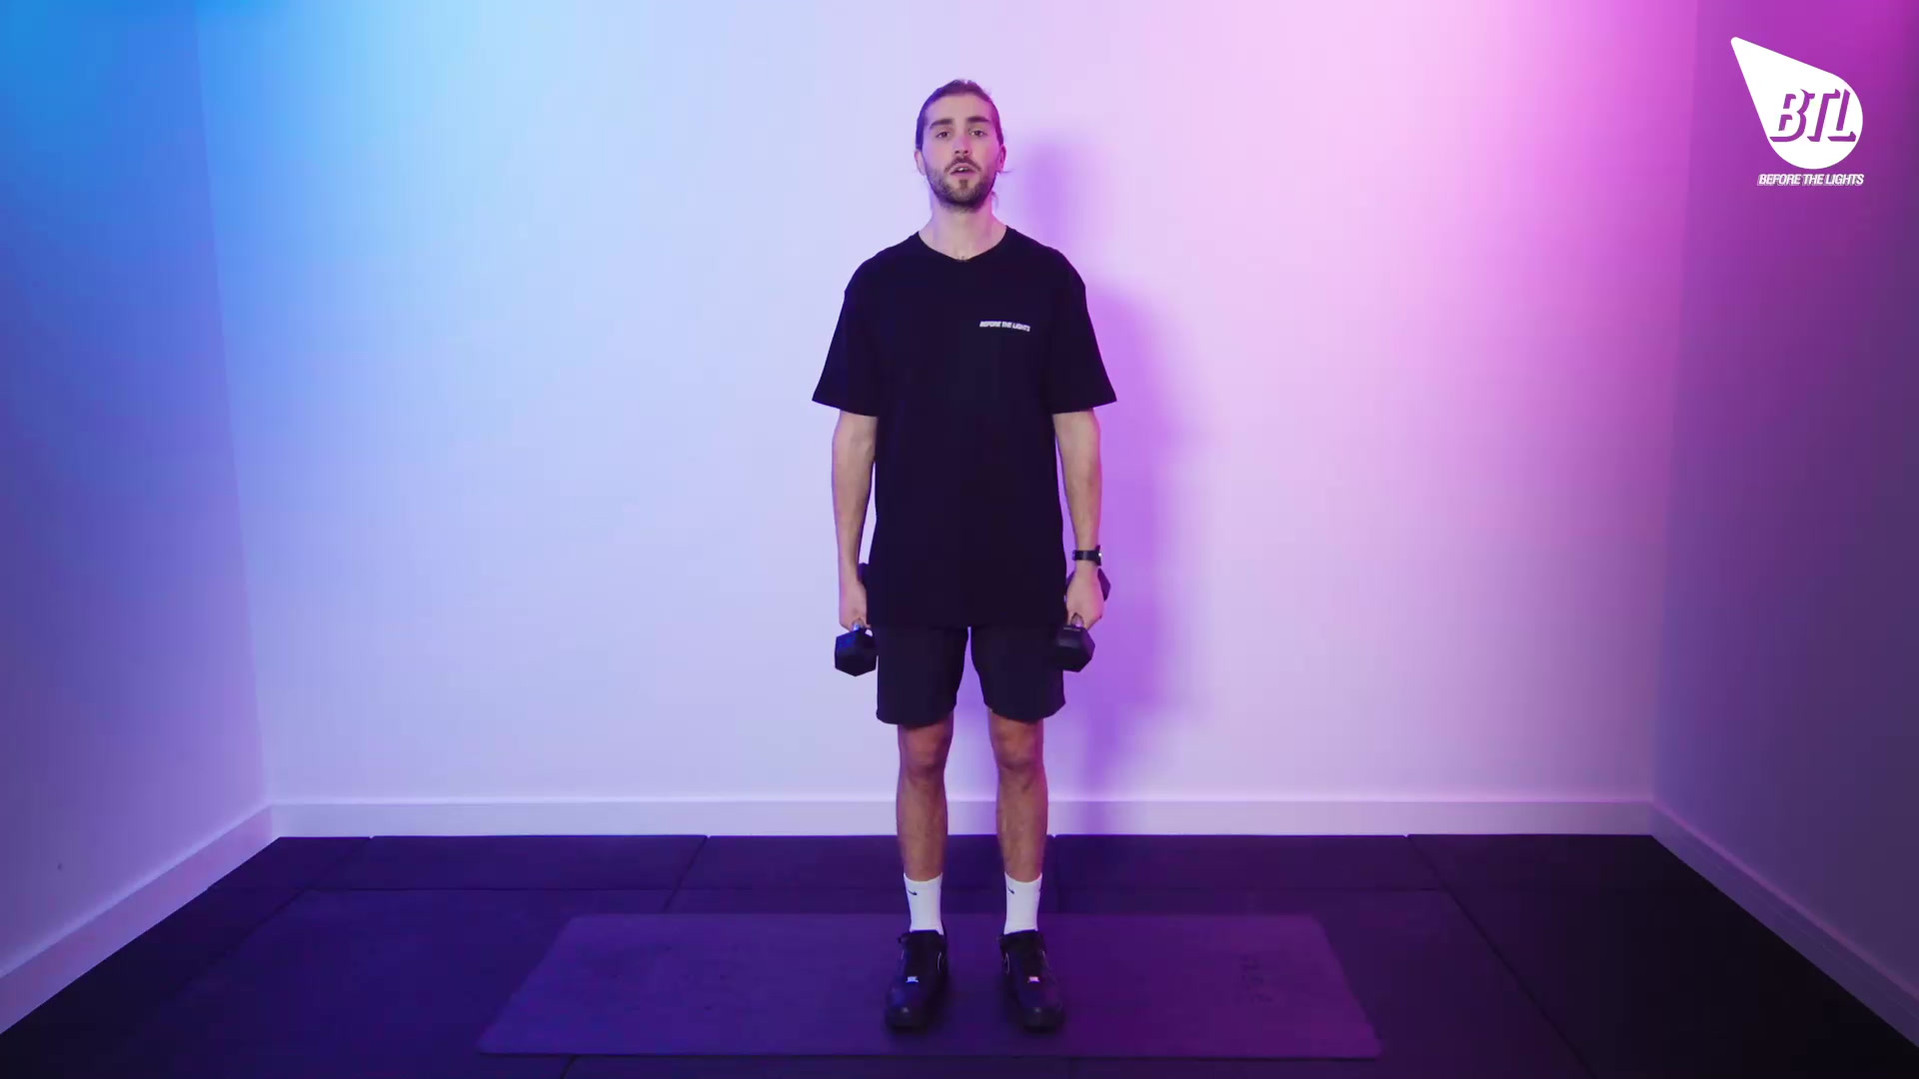 Water Bottle Triceps Kick Back